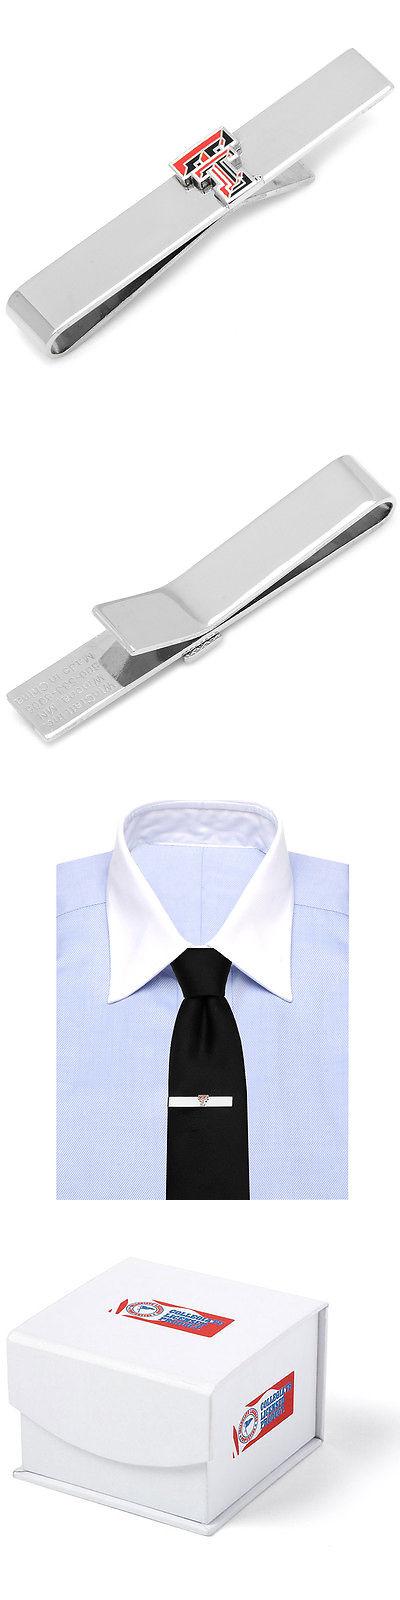 Detroit Lions Tie Bar NFL football logo Tie Clip Clasp Pin